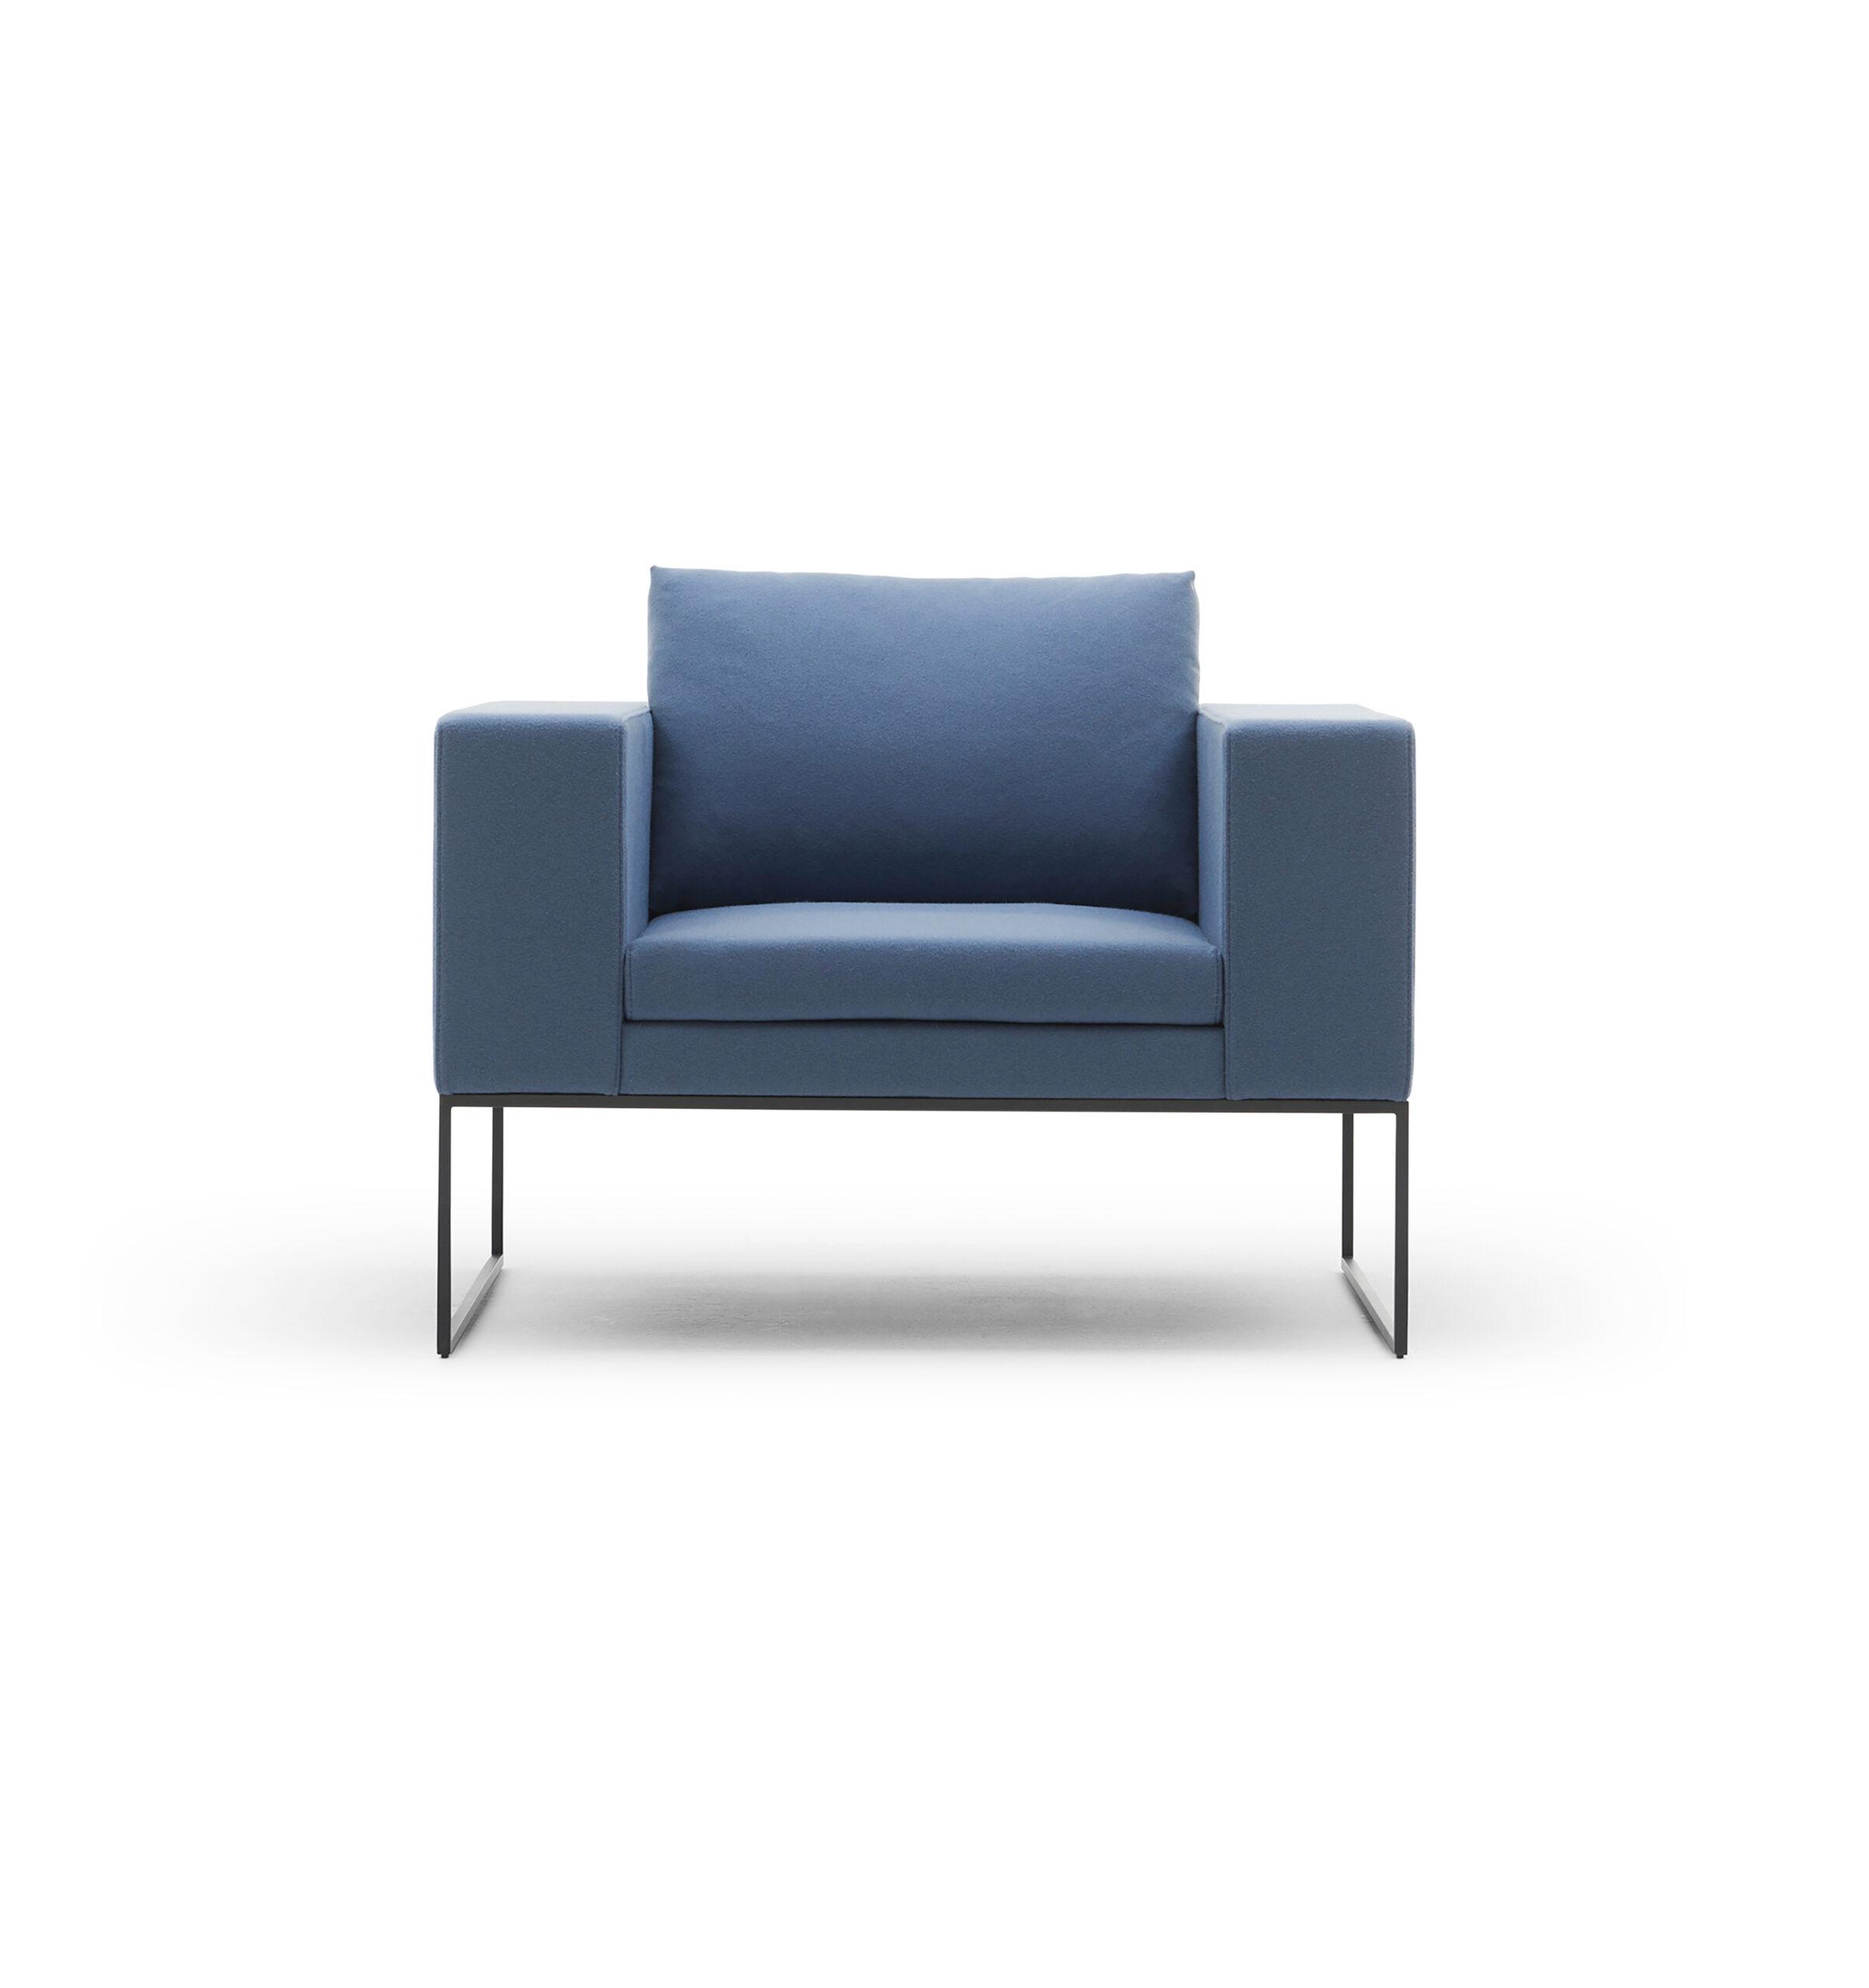 NORA Sofa   Studio by Mobimex